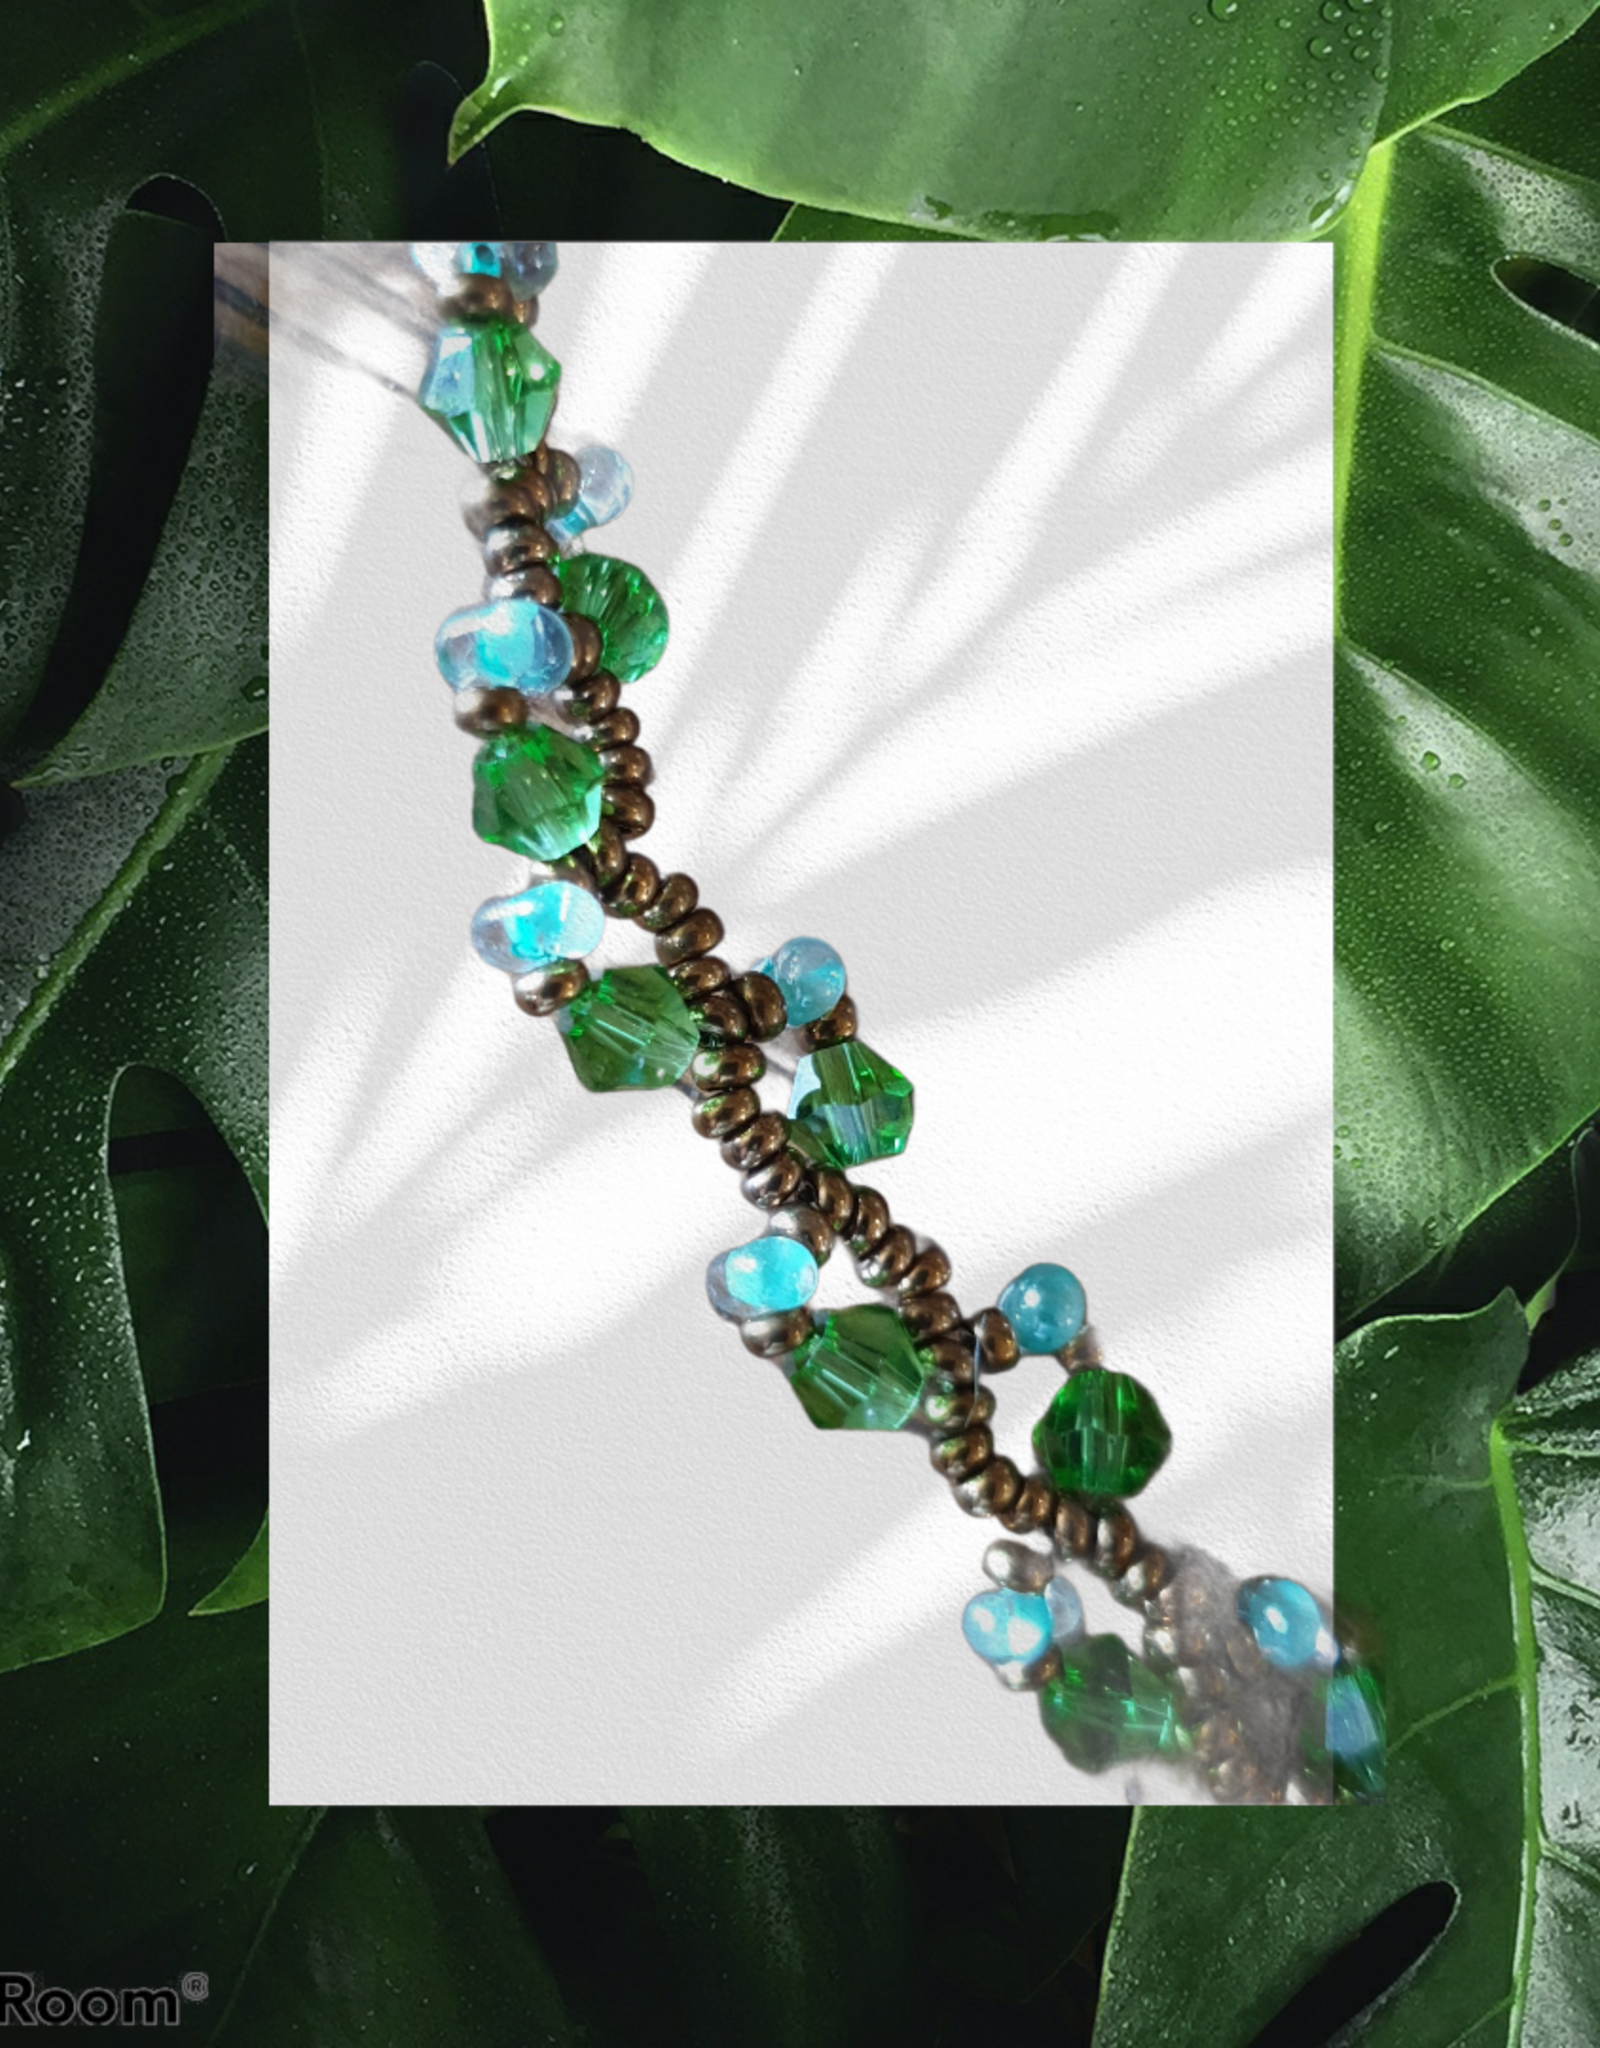 seazido - wevyra green - white swarovski necklace with copper loop